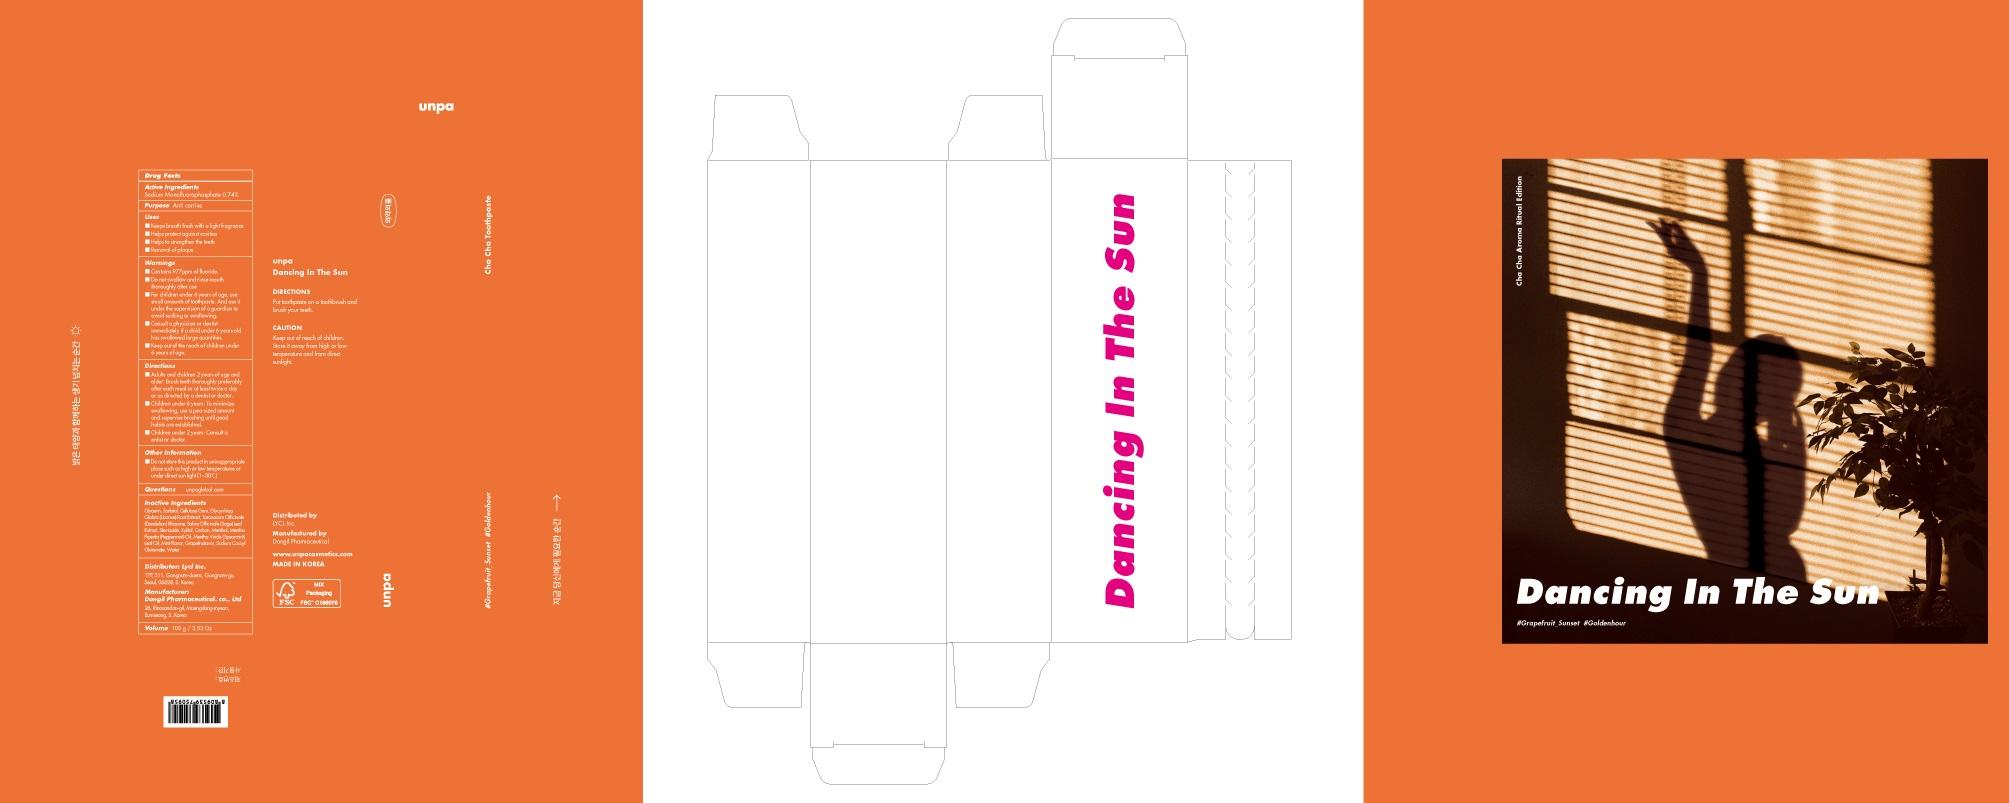 Image of carton